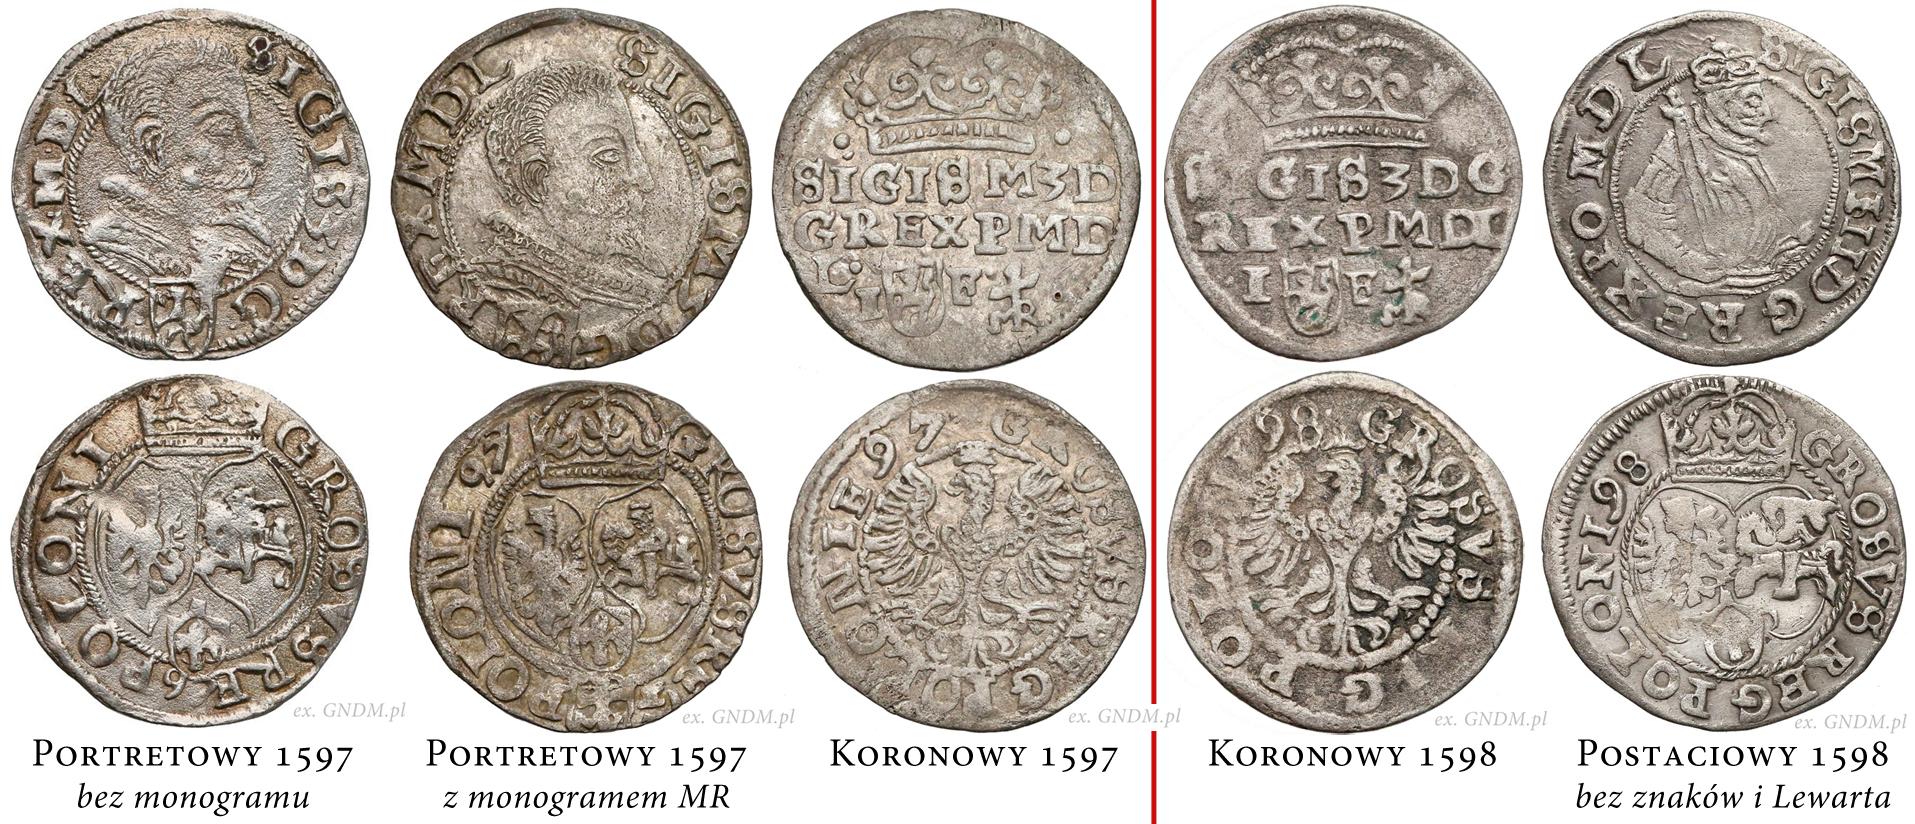 Typy groszy lubelskich 1597-1598